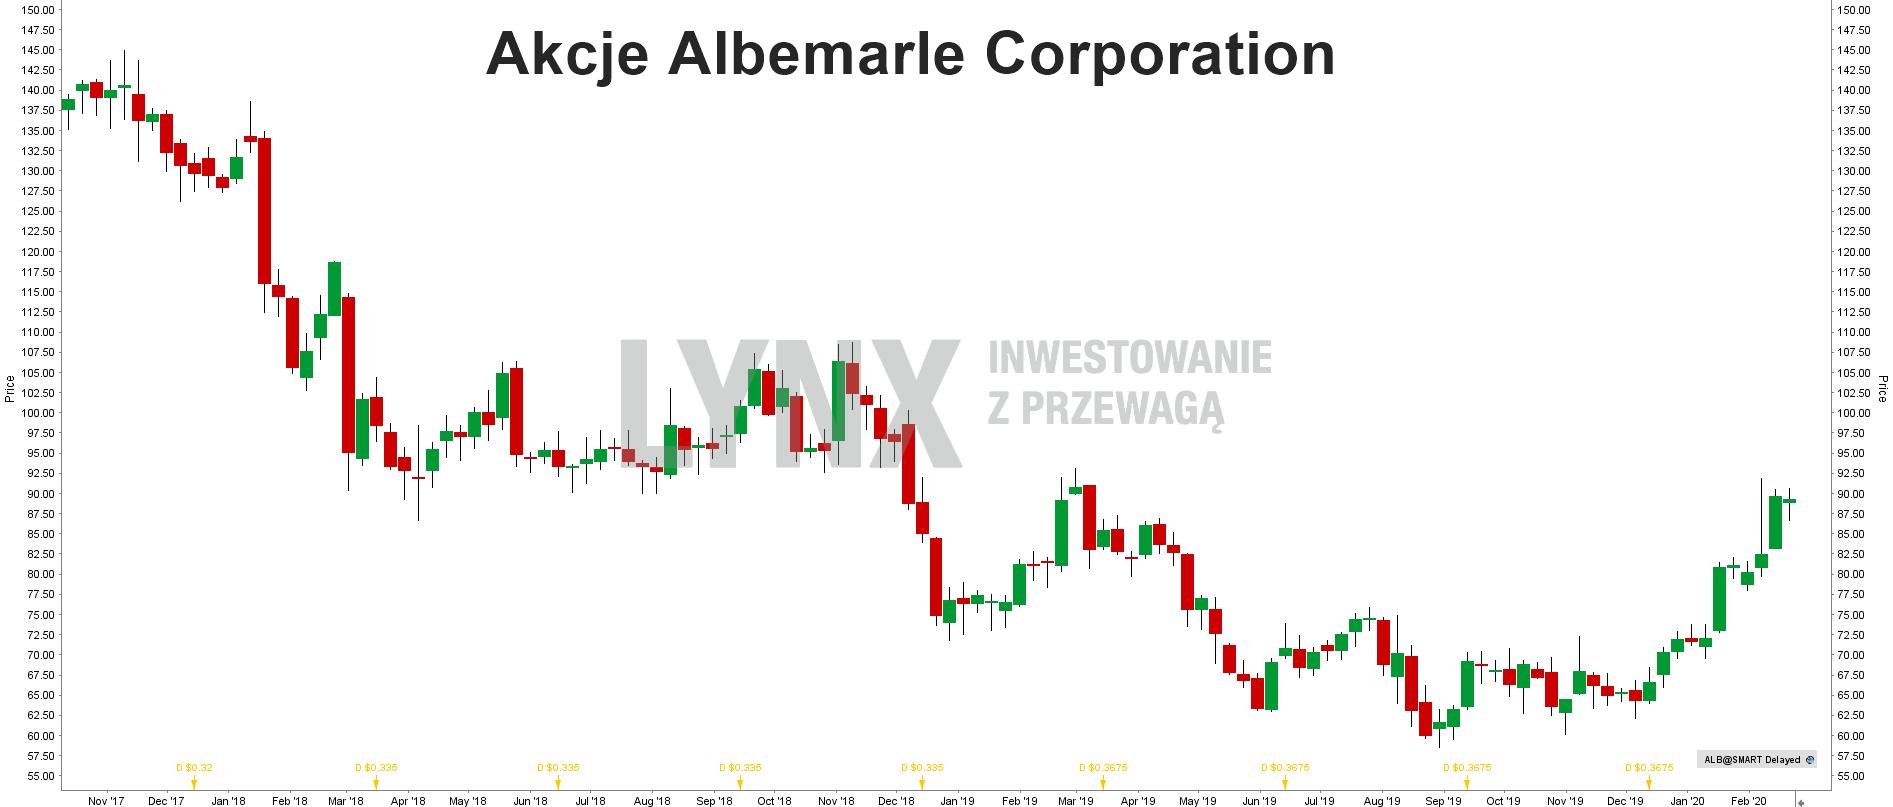 Akcje Albemarle Corporation